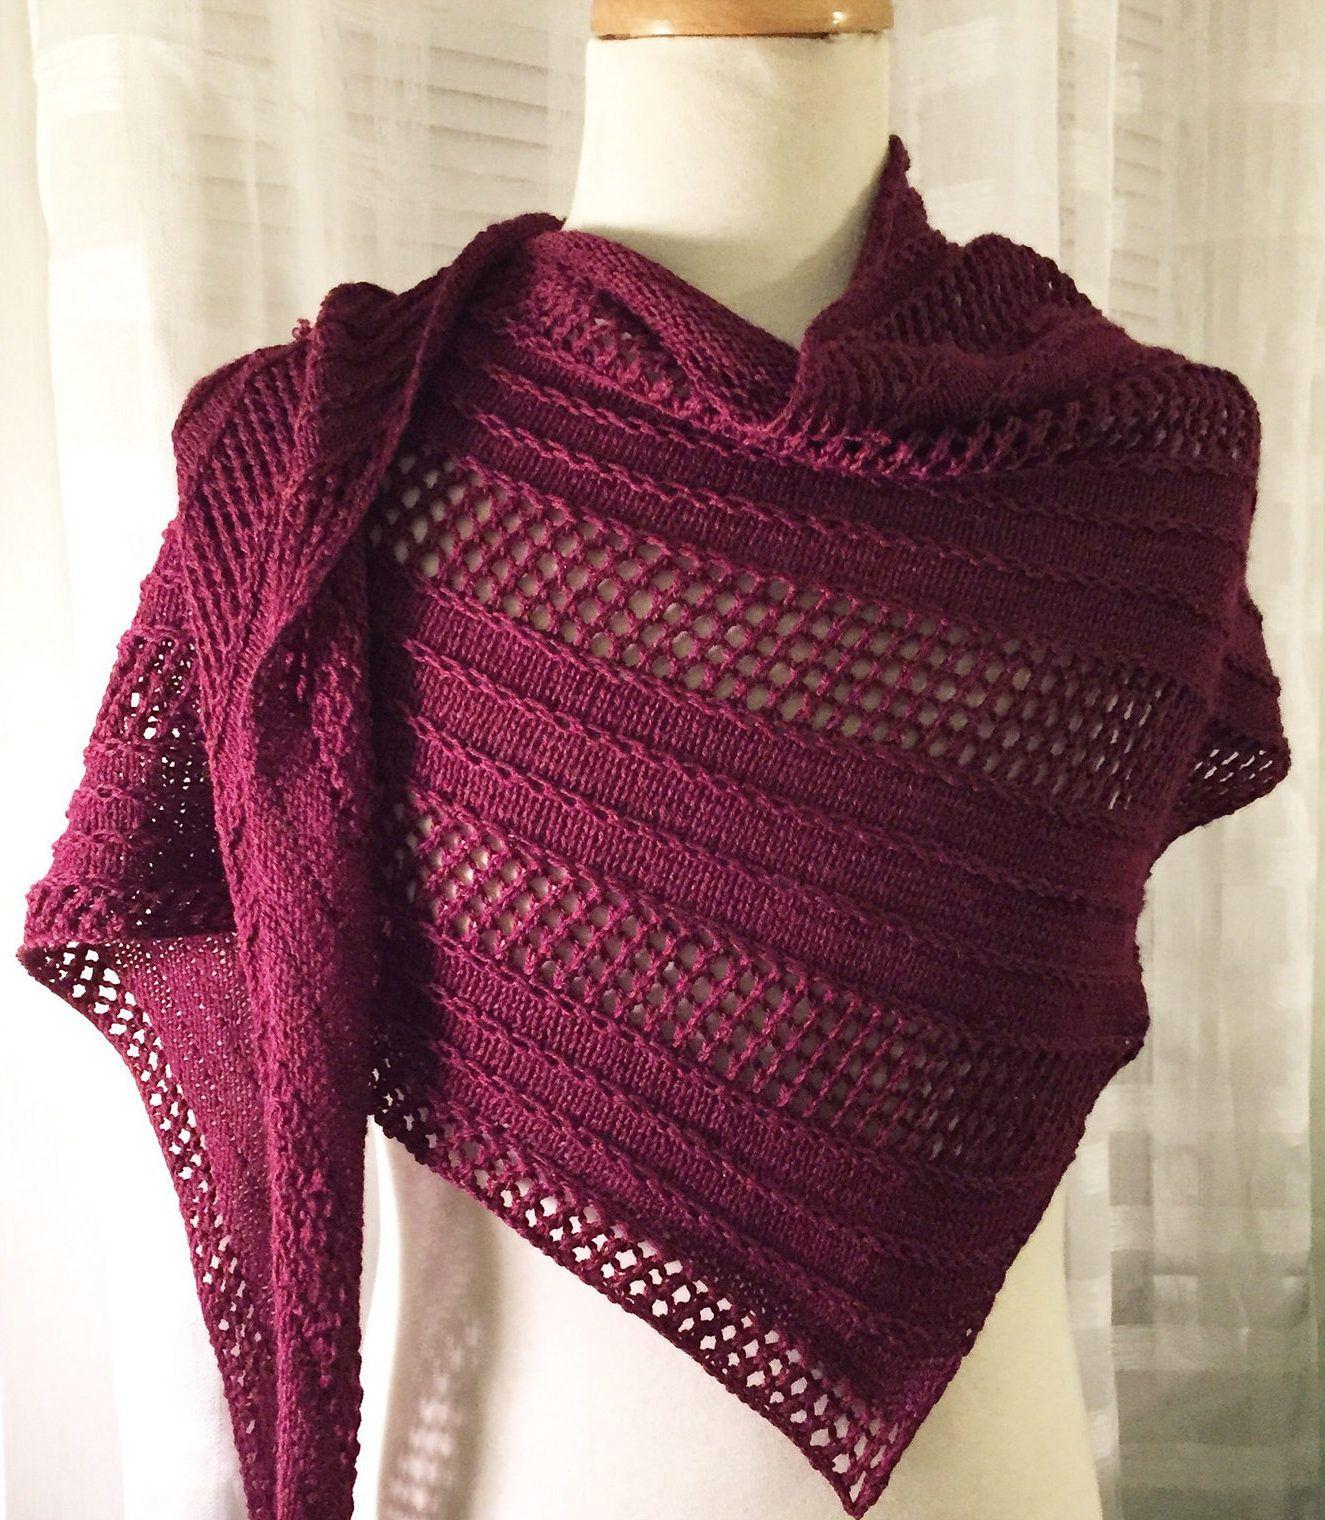 Textured Shawl Knitting Patterns | Ponchos, Chal y Tejido